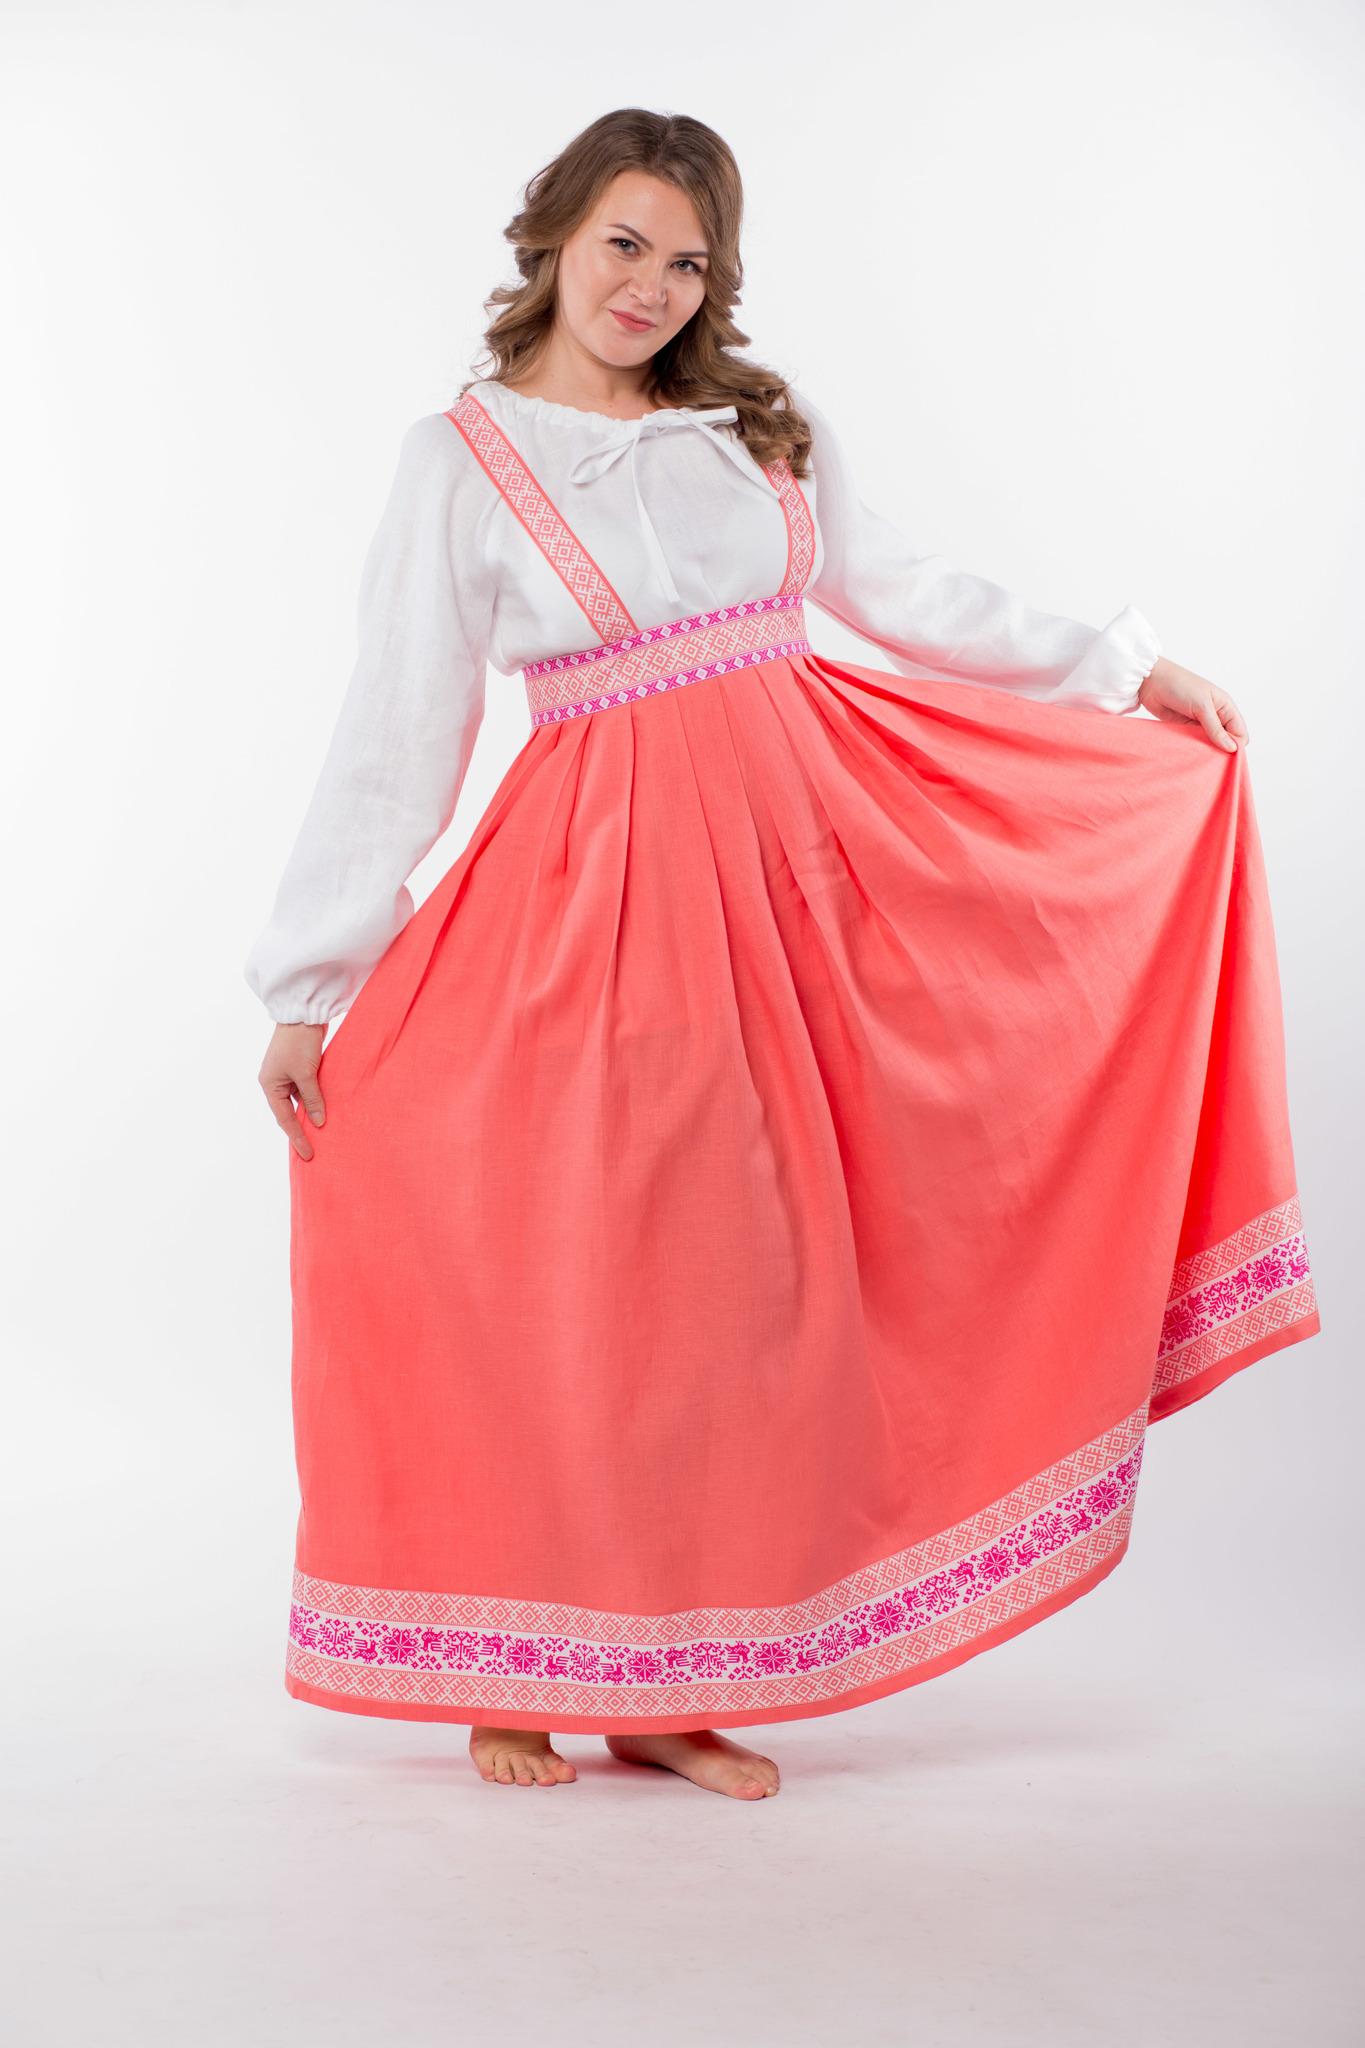 Сарафан подгрудный Орепей размер 48-50 юбка